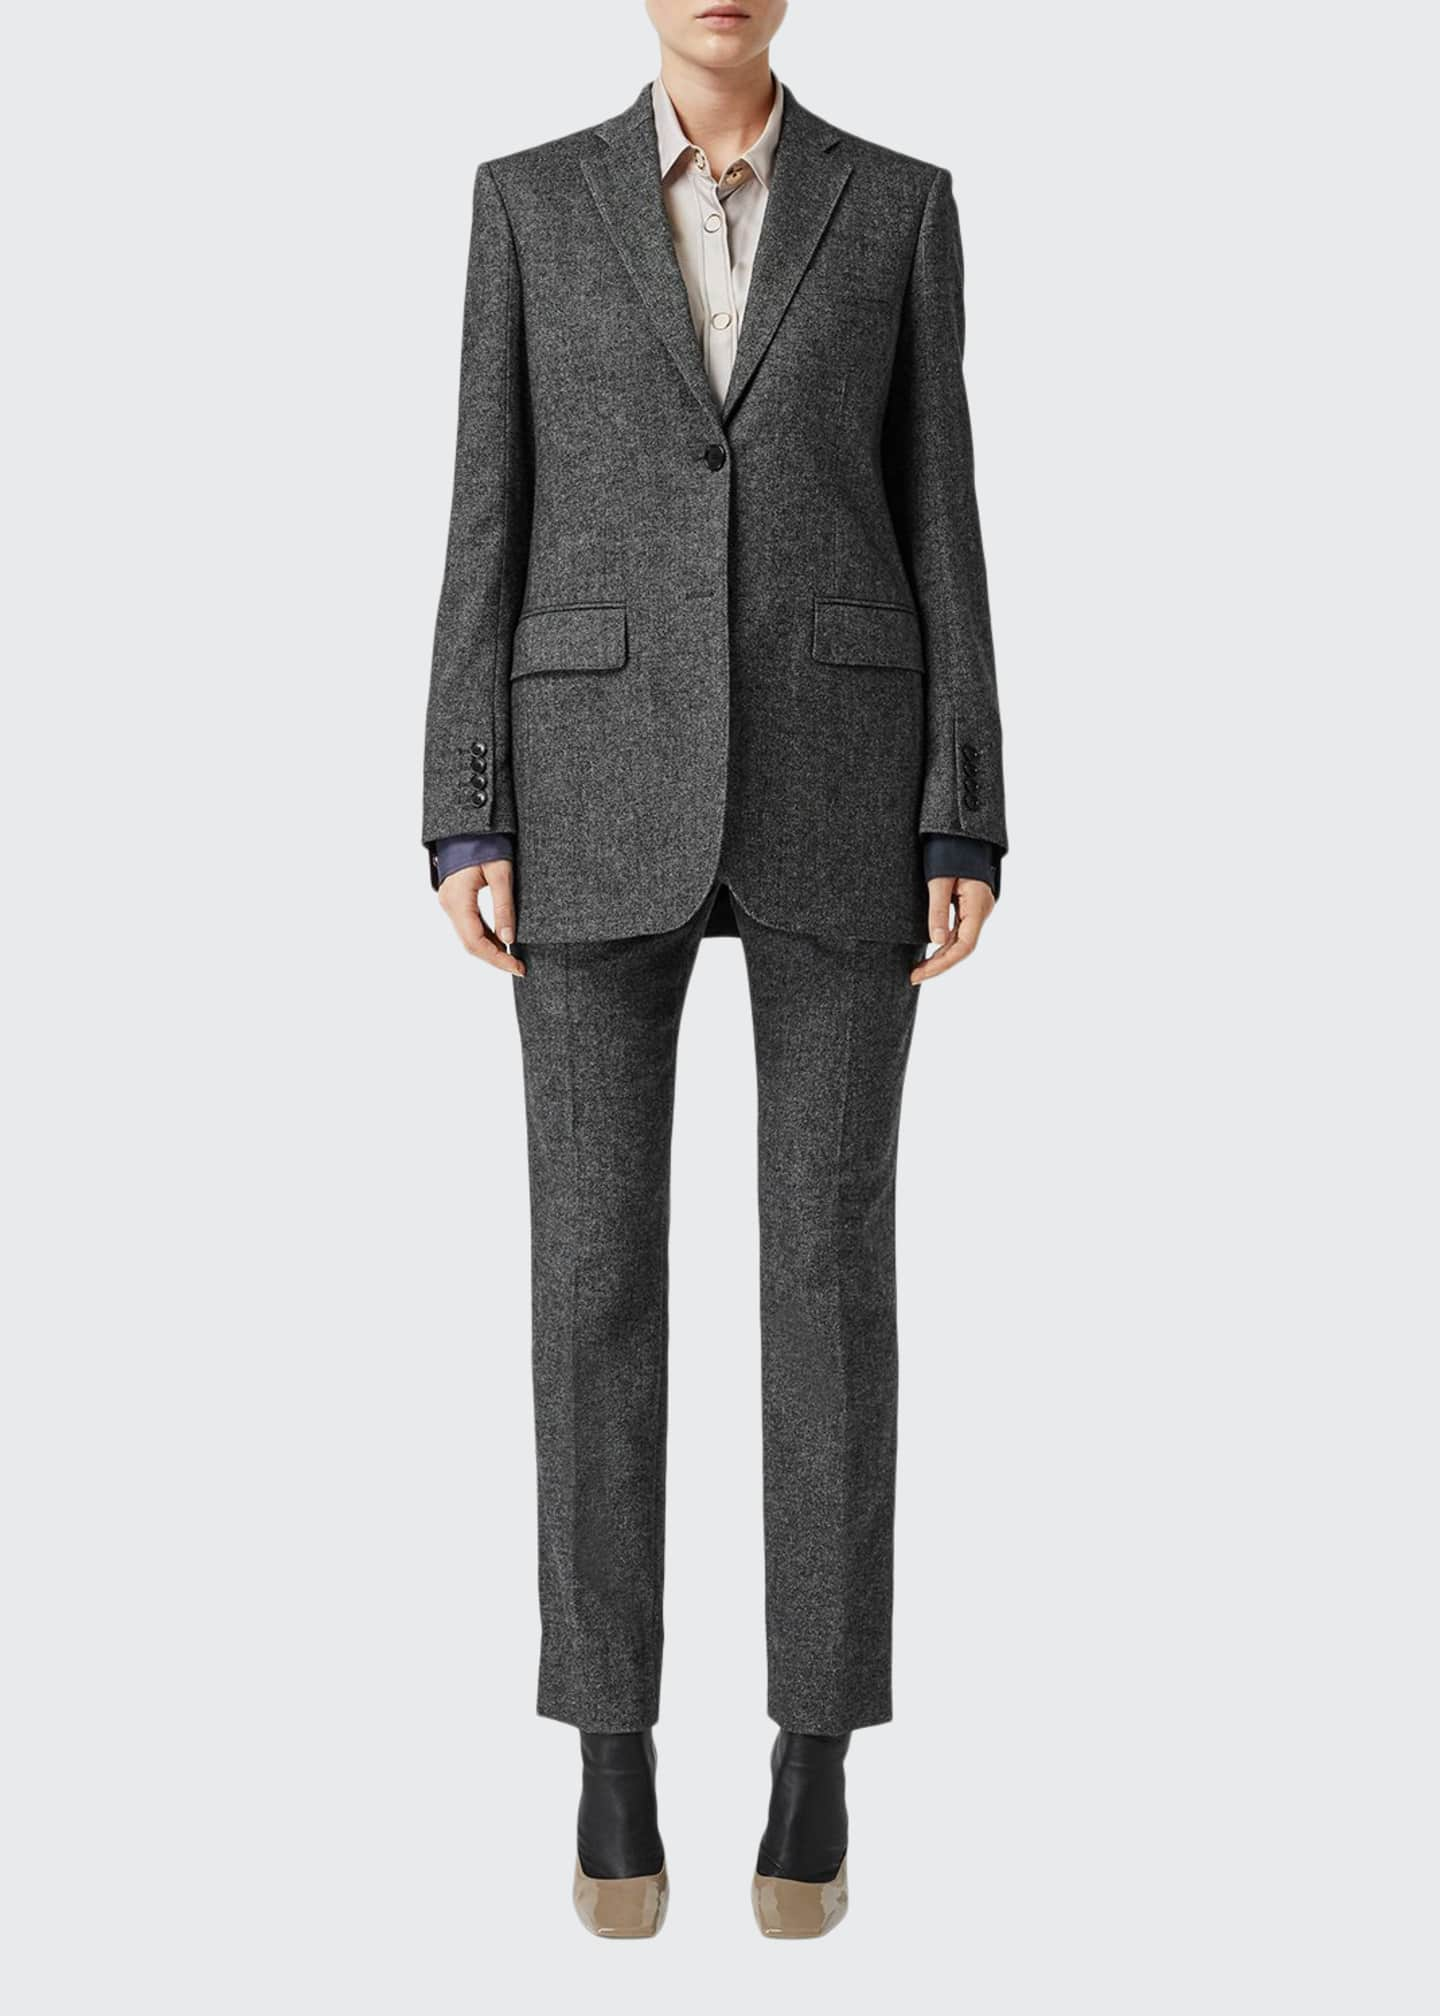 Burberry Marled Wool-Cashmere Boxy Tailored Blazer Jacket